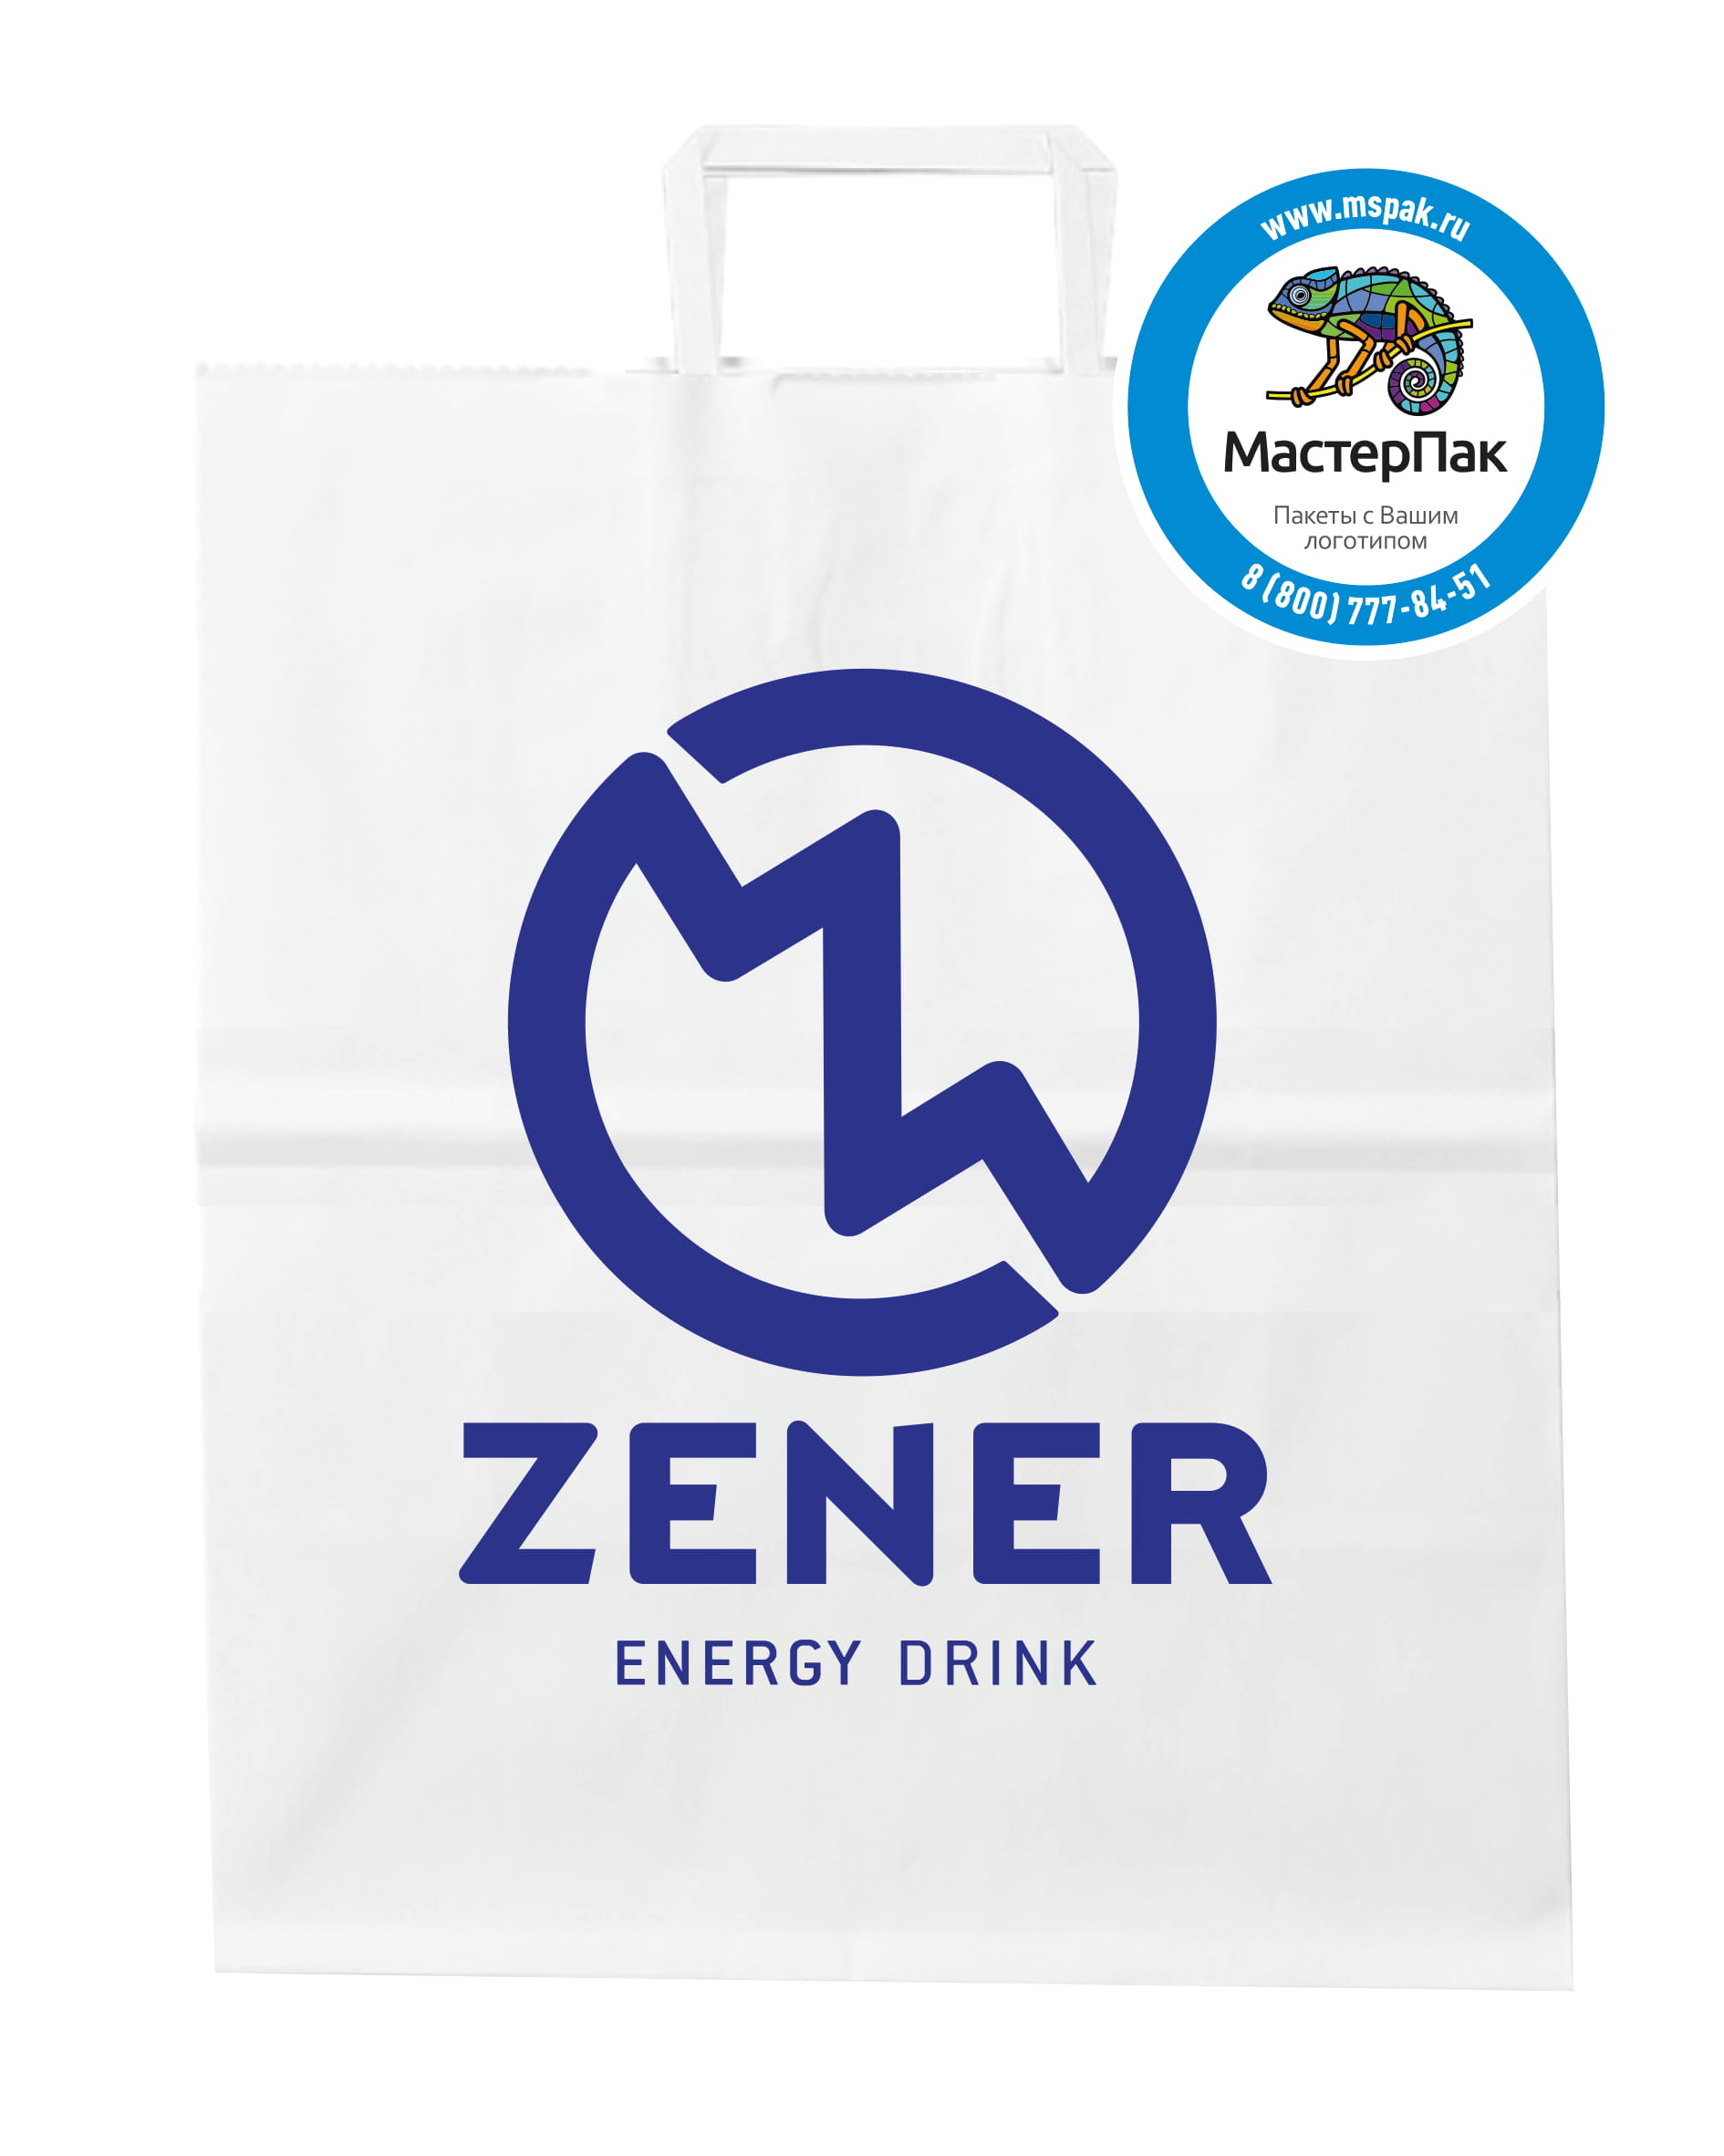 Пакет крафт, бумажный с логотипом Zener